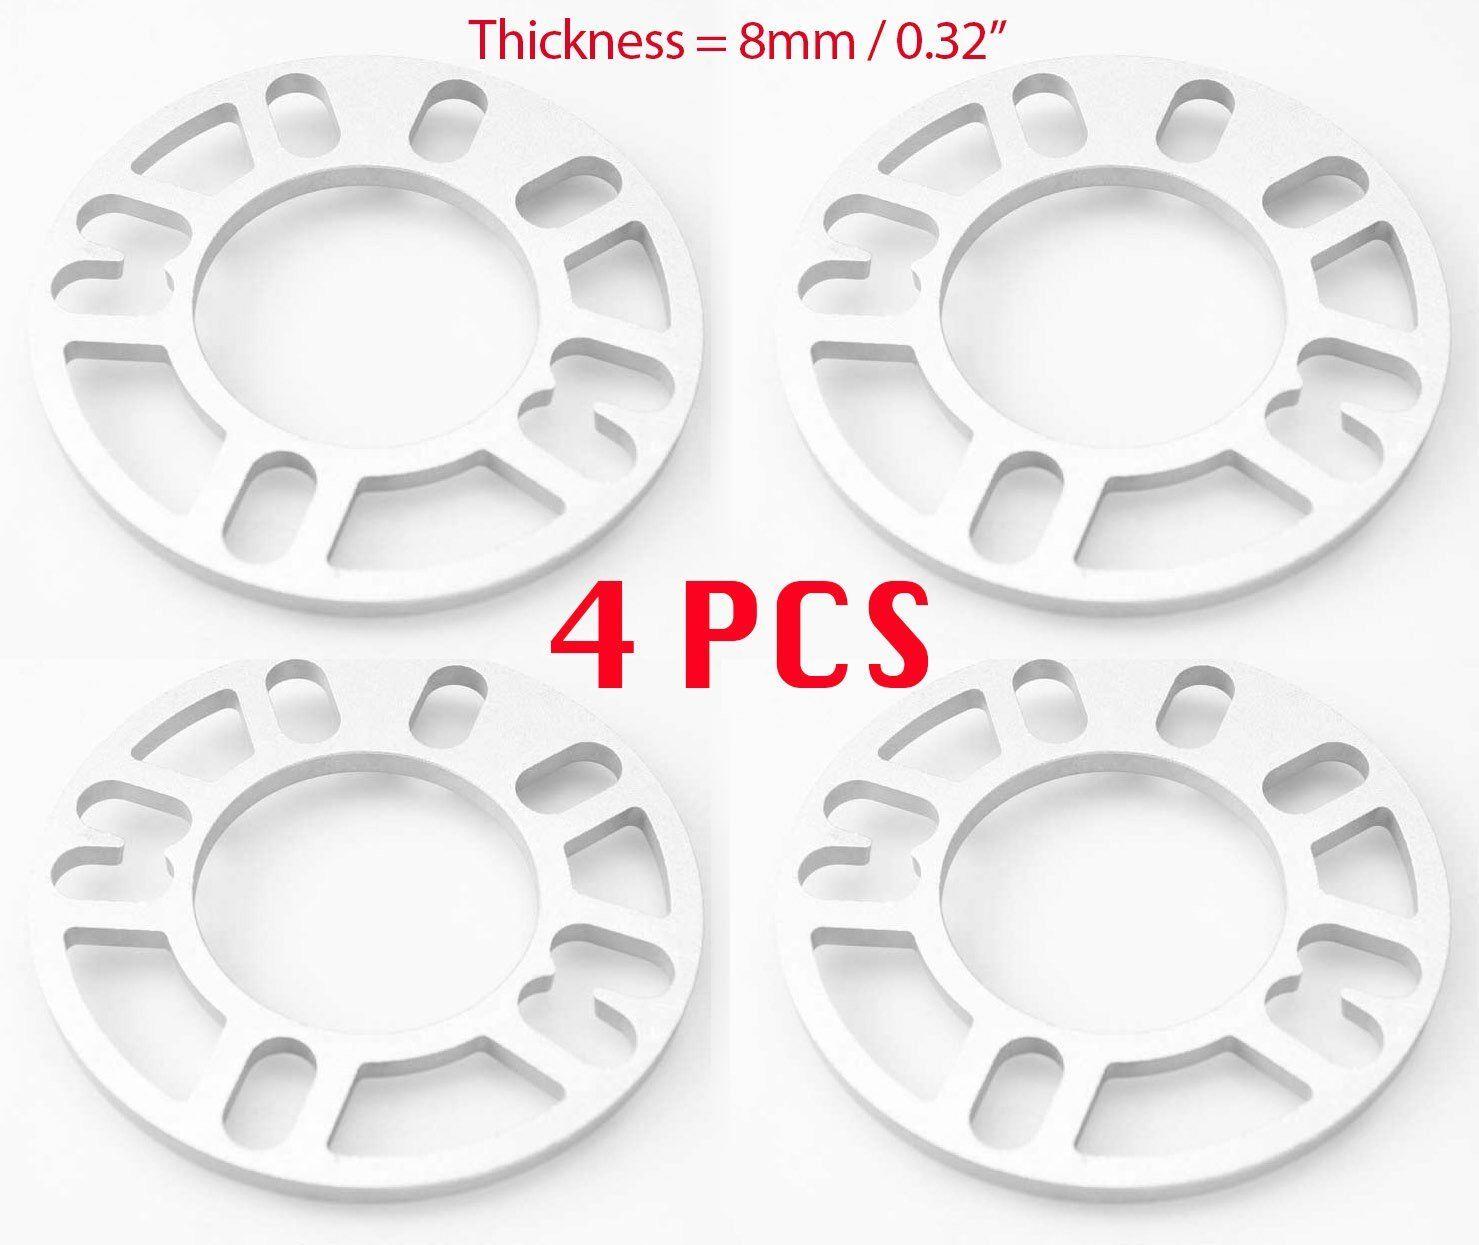 4Pcs 8mm Car Wheel Spacer Adaptor 5x100 5x114 11PCS Pry Tool Fit Chevrolet